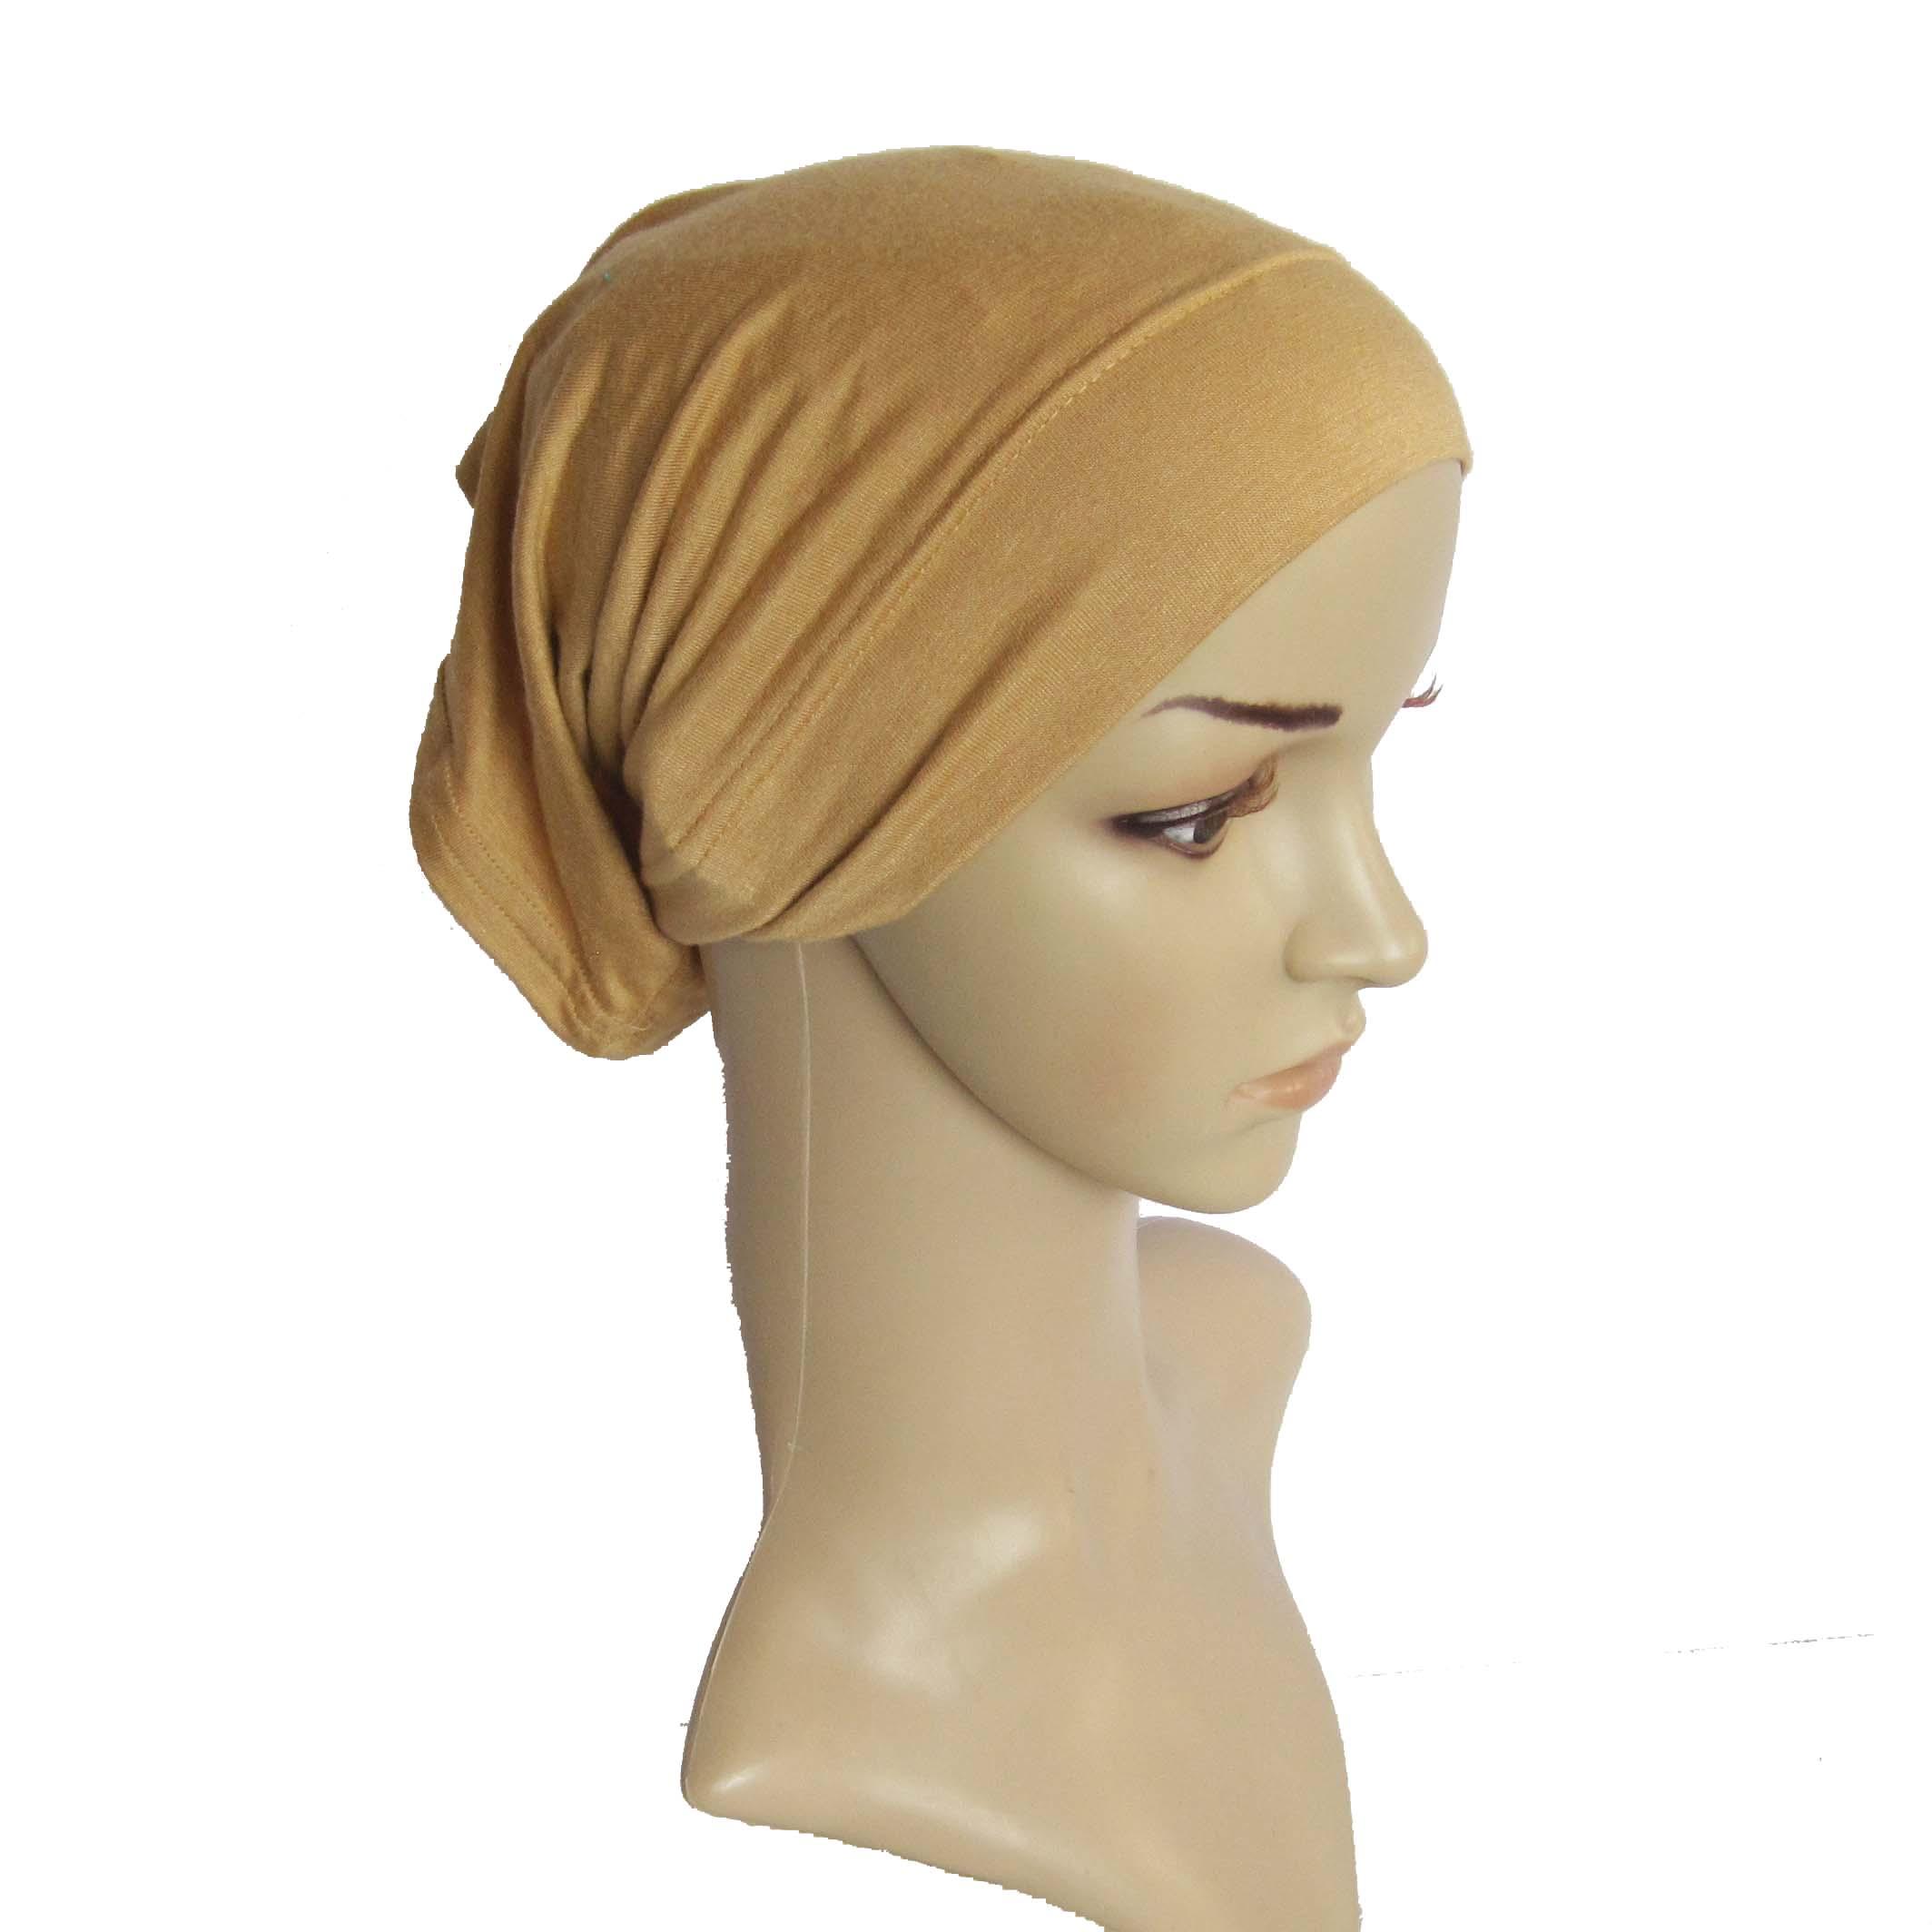 Islamic Clothing New Leopard Print Women Turban Hats Muslim Fashion Womens Hijabs Cotton Cover Inner Hijab Cap Islamic Head Wear Hat Under Scarf Shrink-Proof